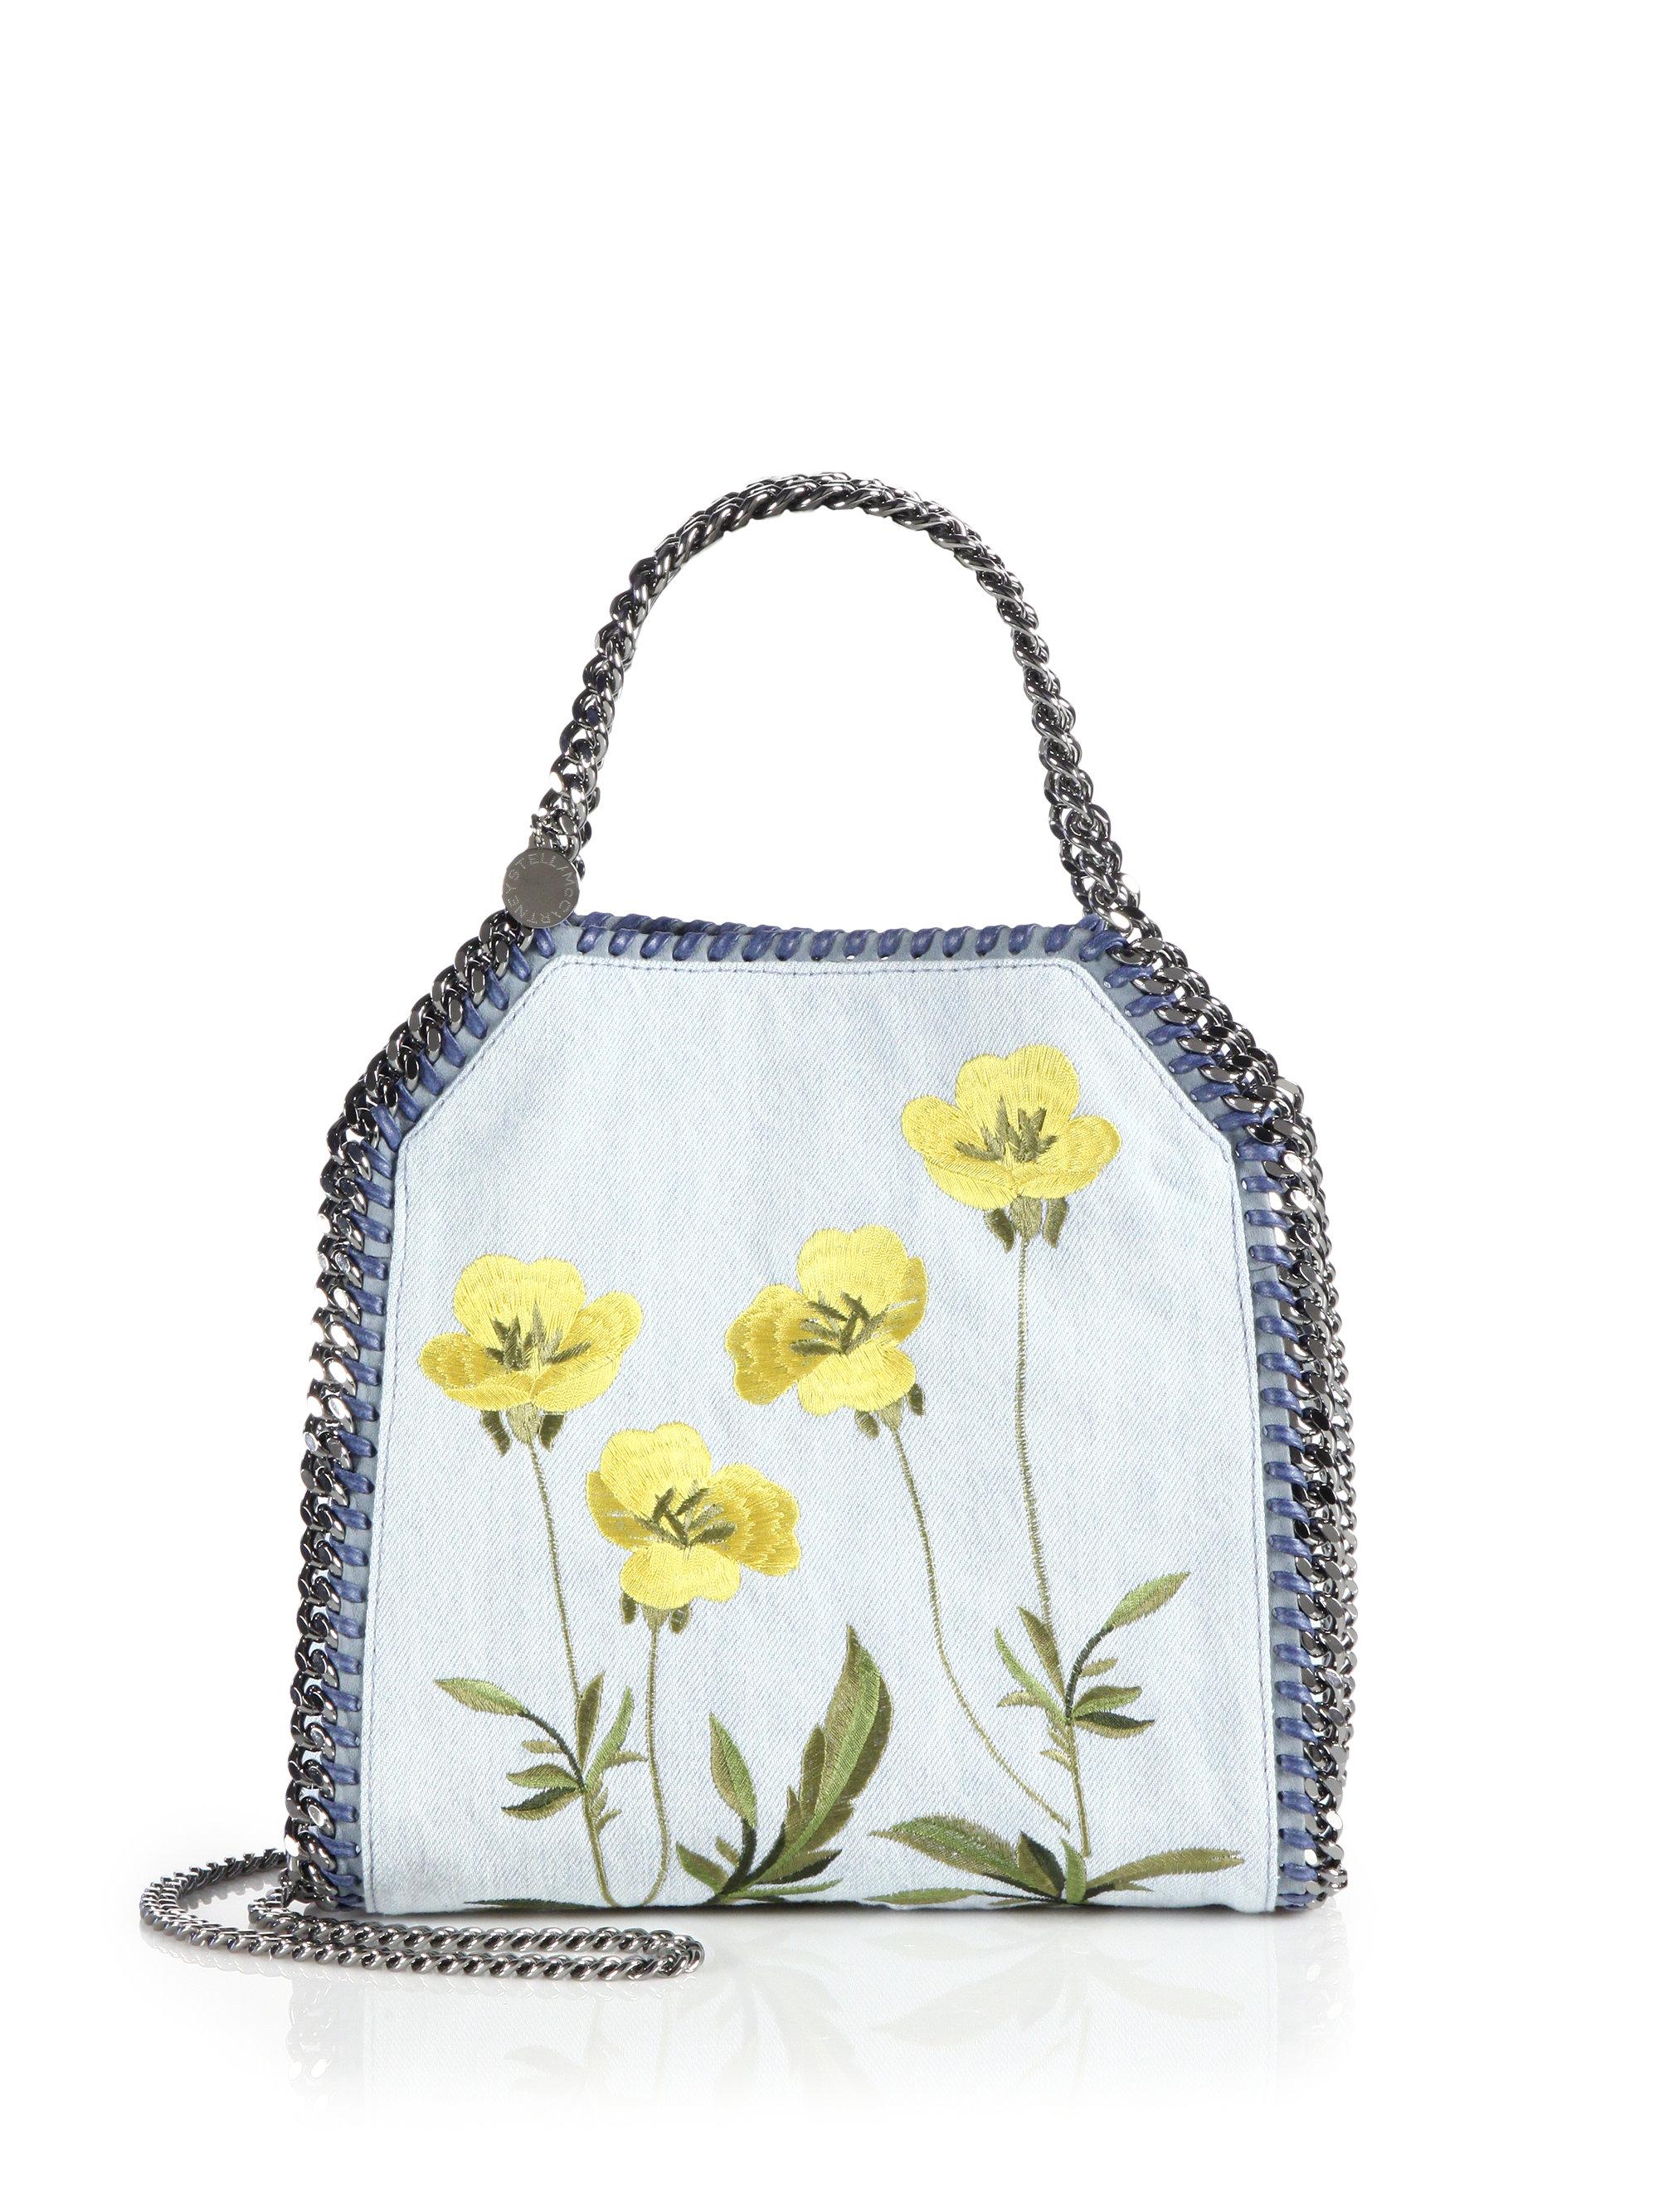 ea188d52416f4 Lyst - Stella McCartney Falabella Mini Baby Bella Floral Embroidered ...